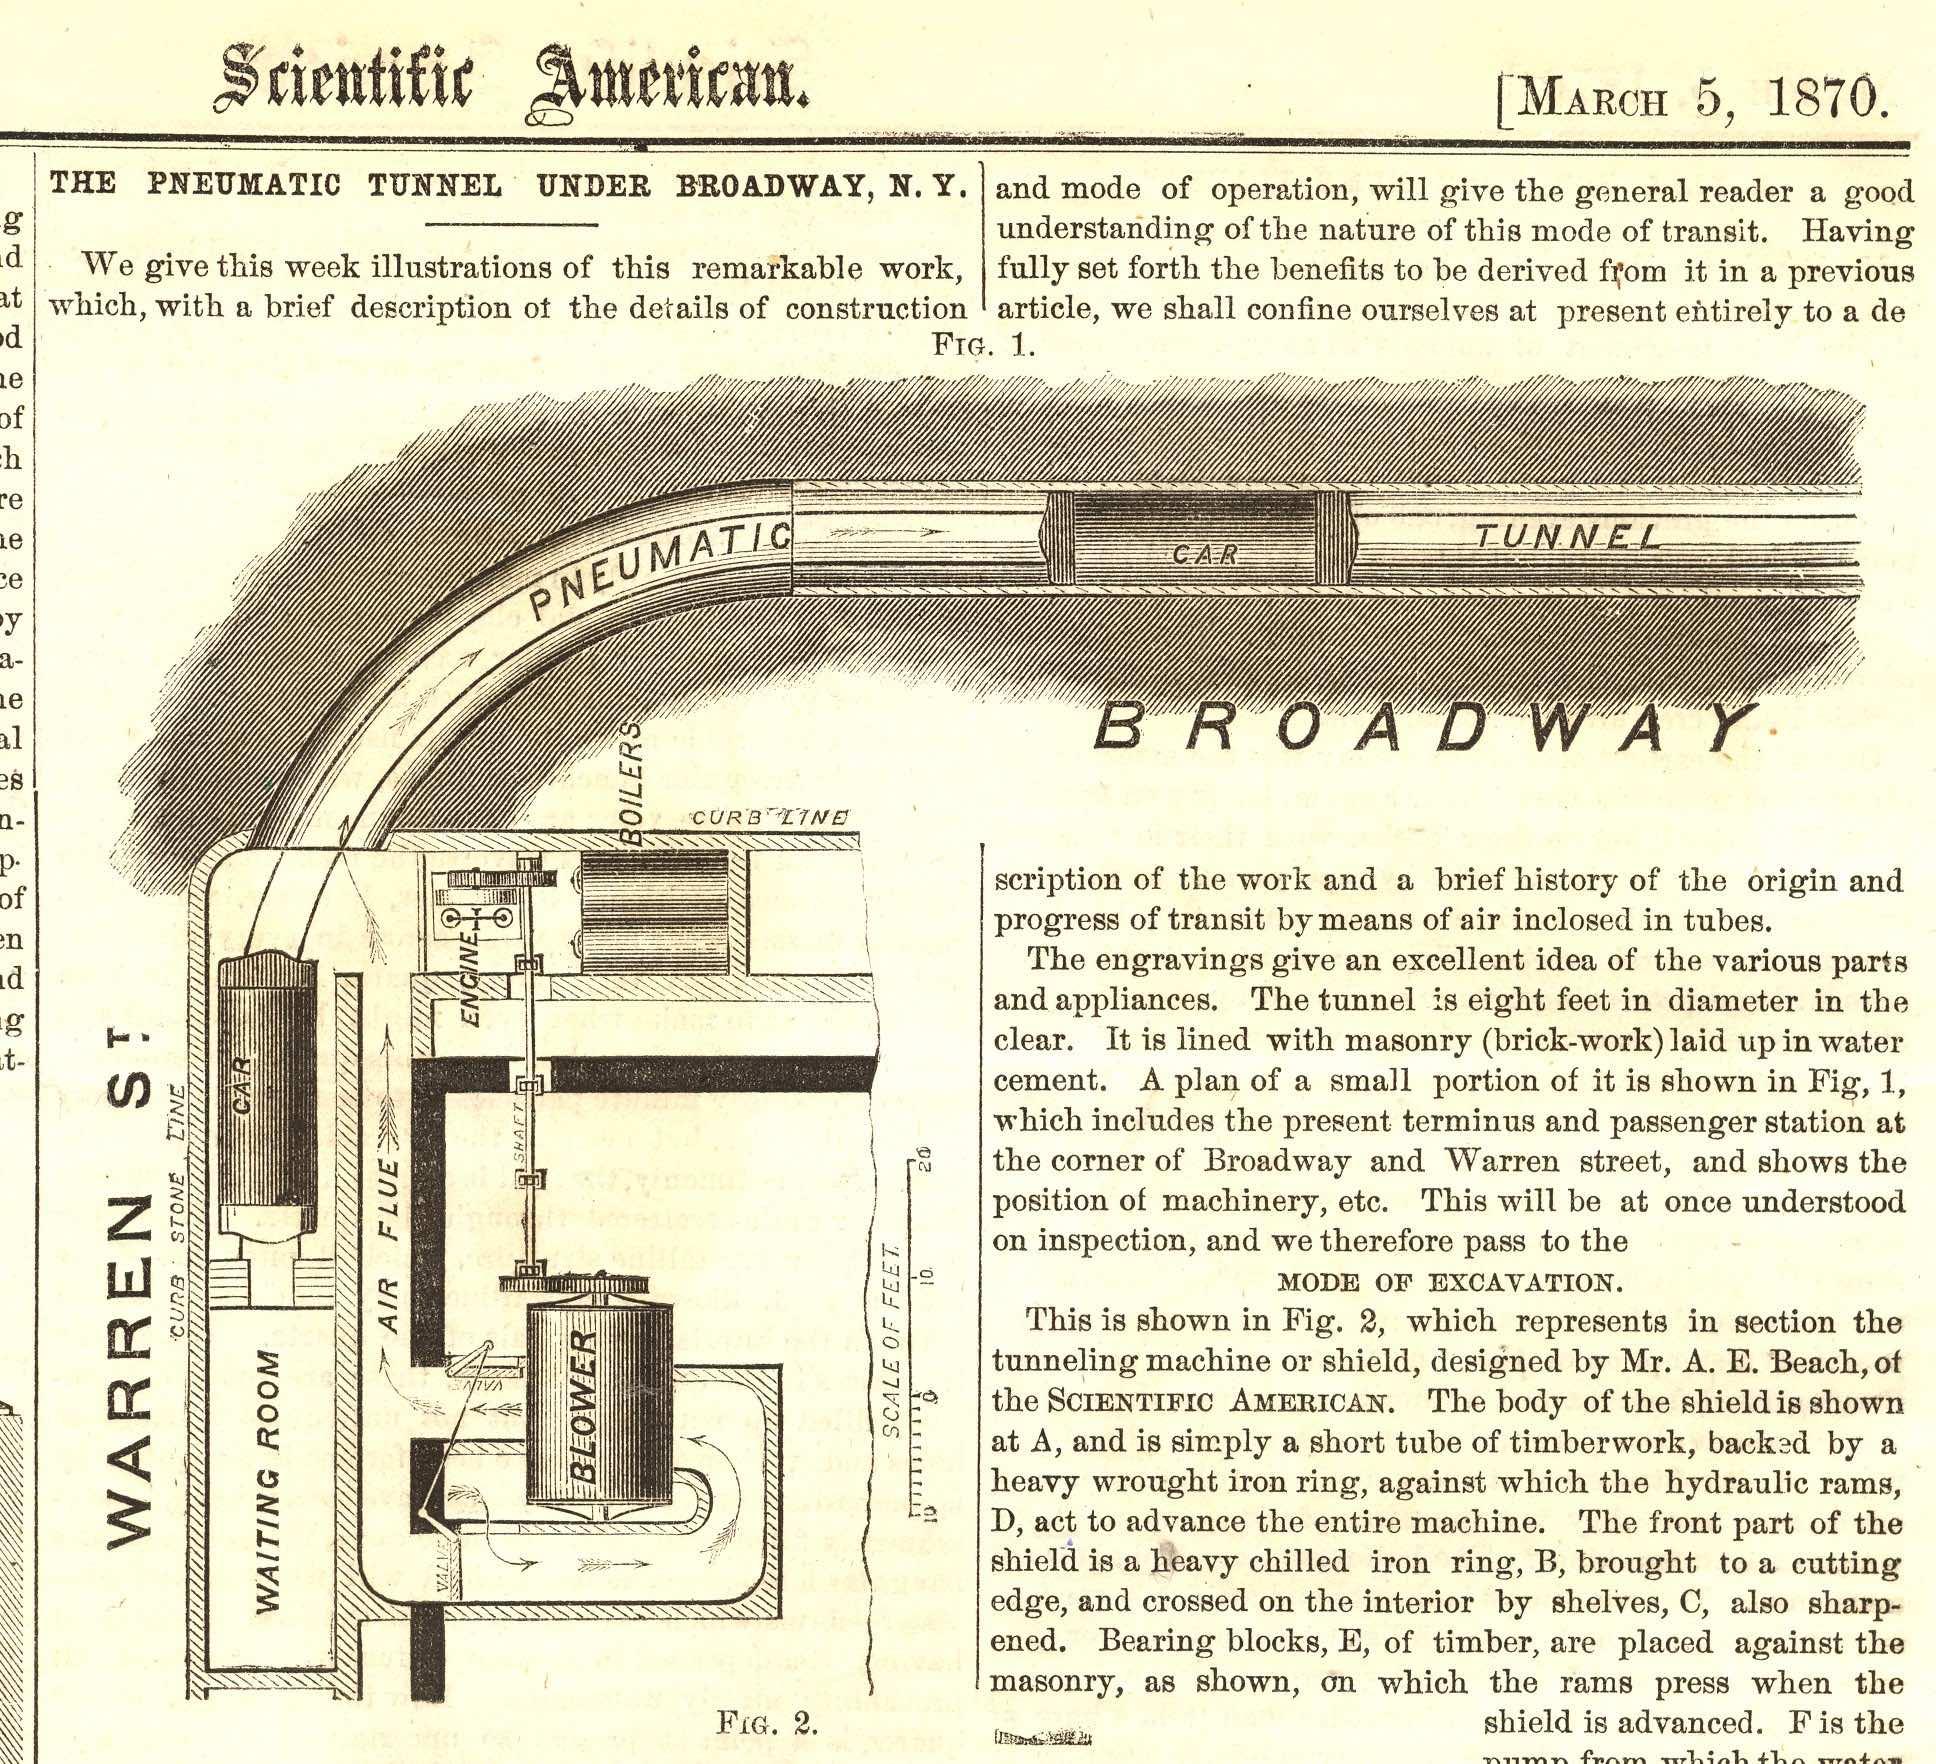 Scientific American , 1870.